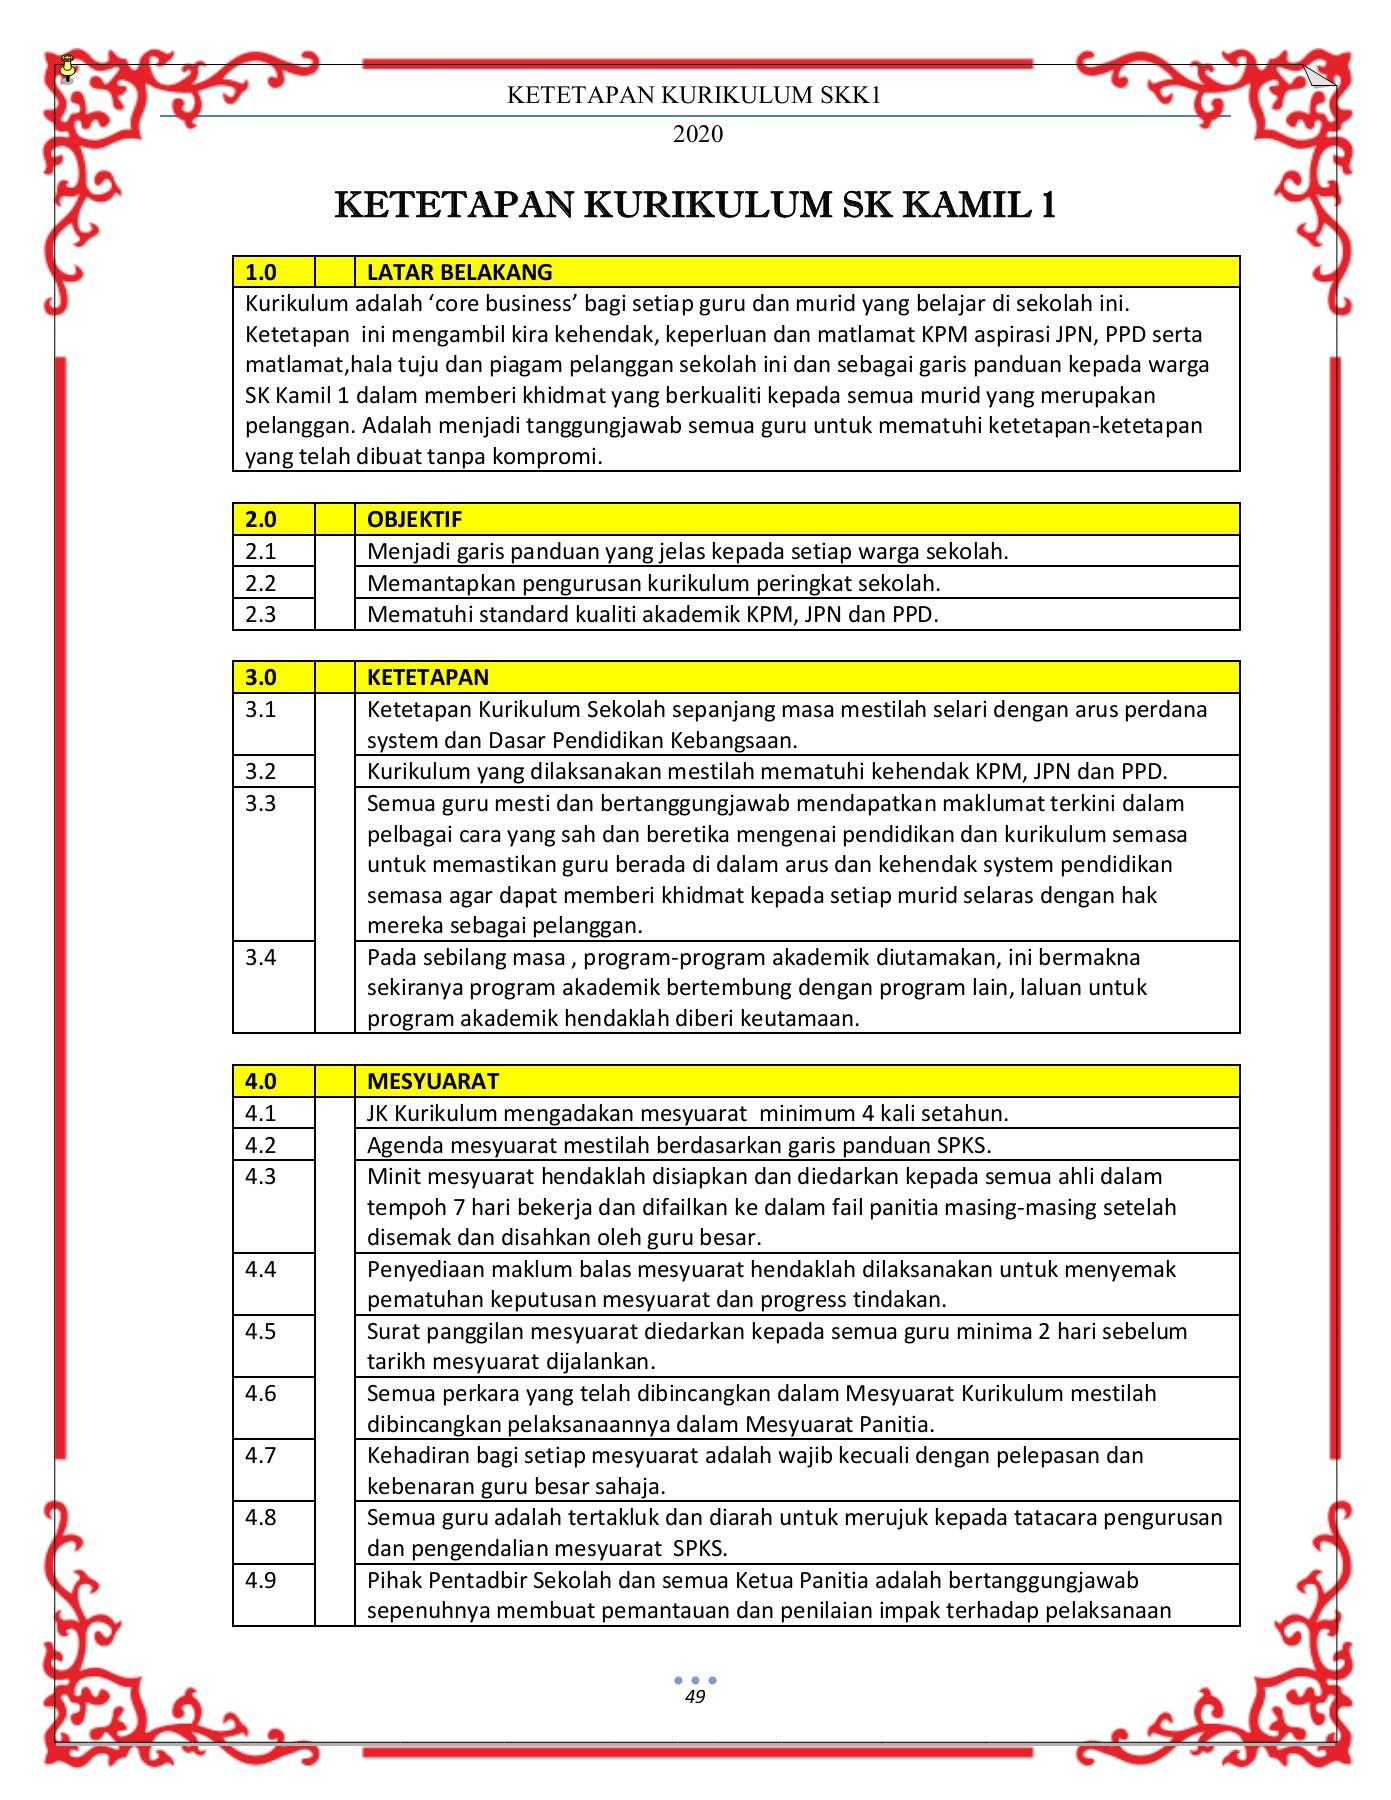 Buku Manual Pemgurusan Skk1 2020 Flip Book Pages 51 100 Pubhtml5